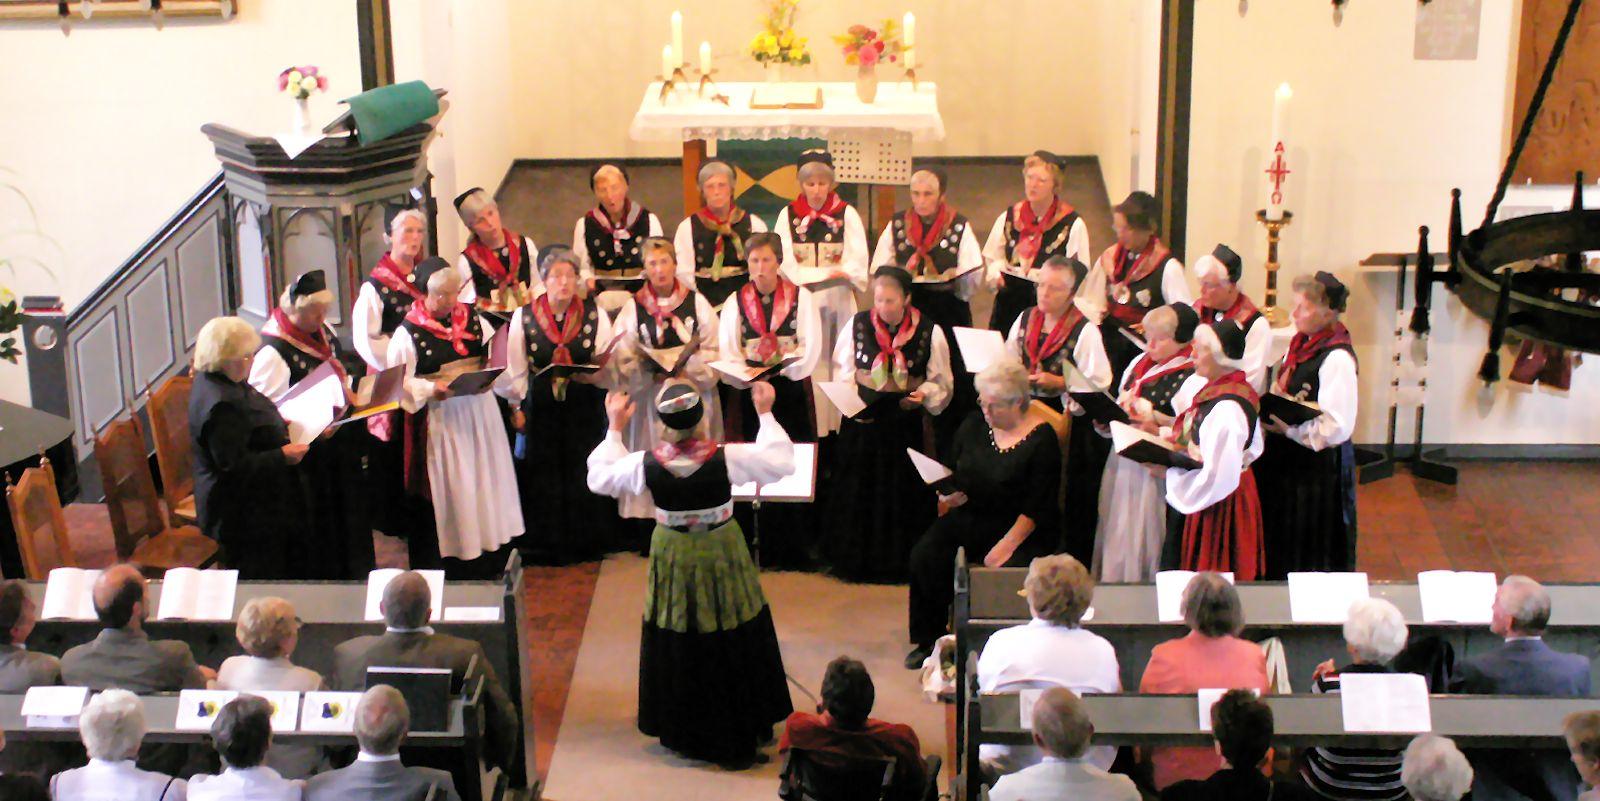 Probsteier Landfrauenchor